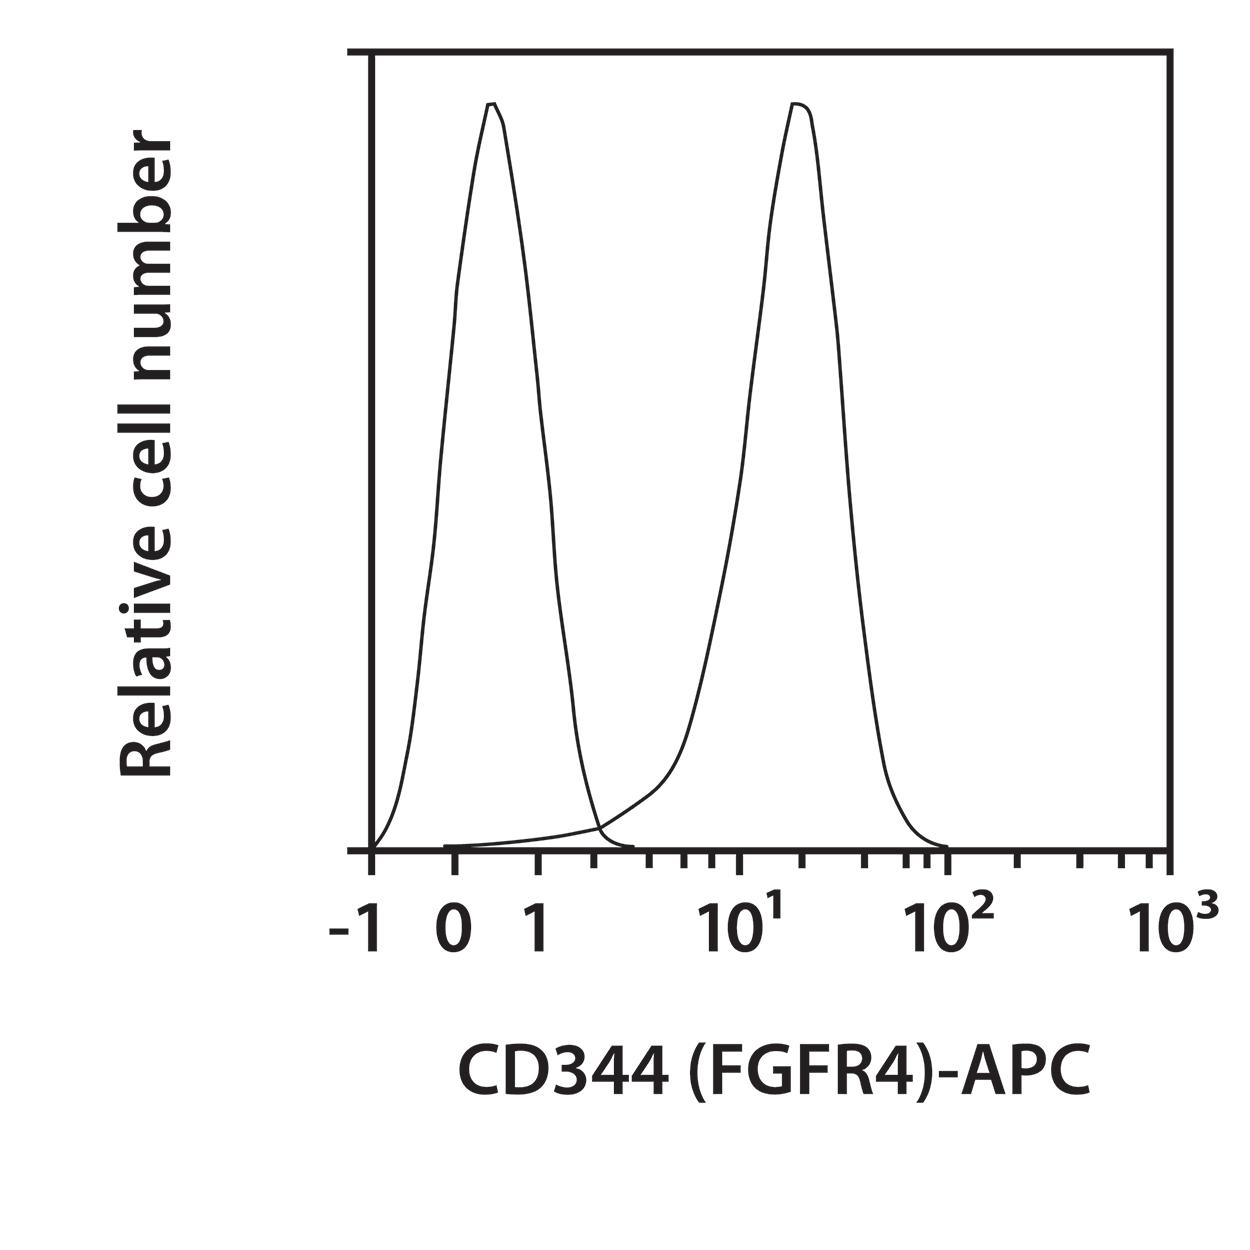 CD334 (FGFR4) Antibody, anti-human, REAfinity™